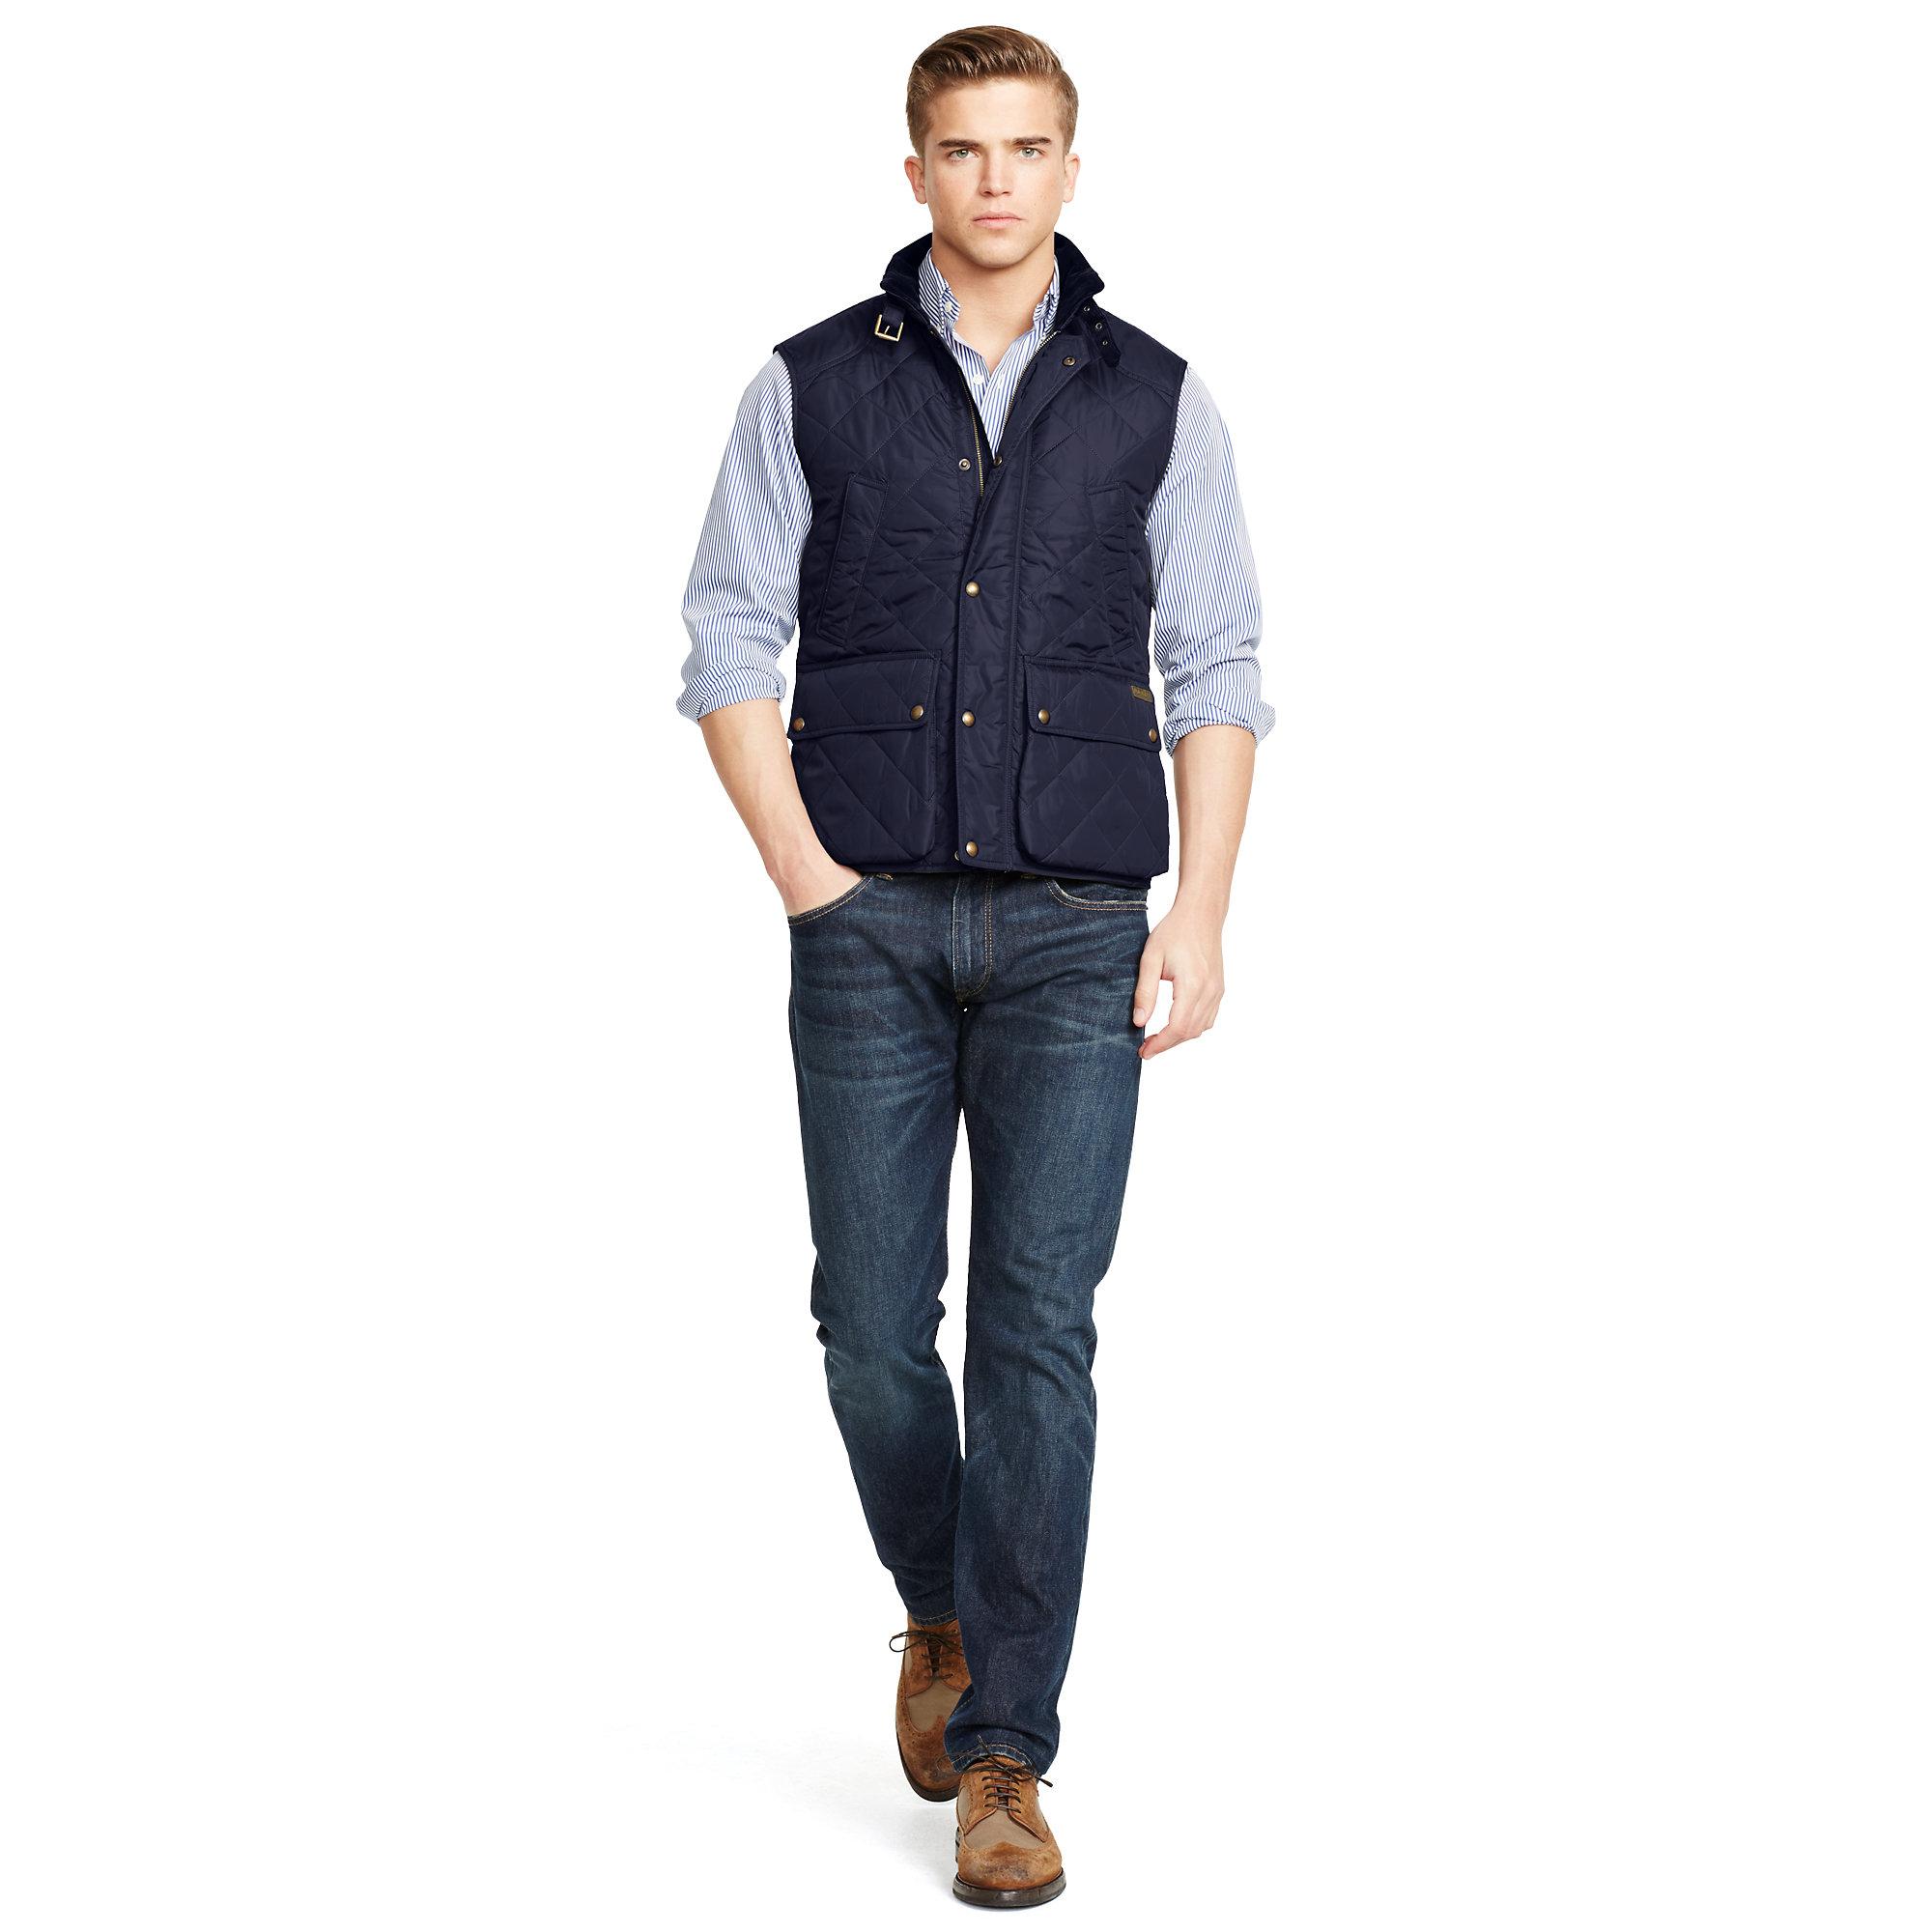 Polo ralph lauren Diamond-quilted Vest in Blue for Men | Lyst : ralph lauren quilted vest mens - Adamdwight.com